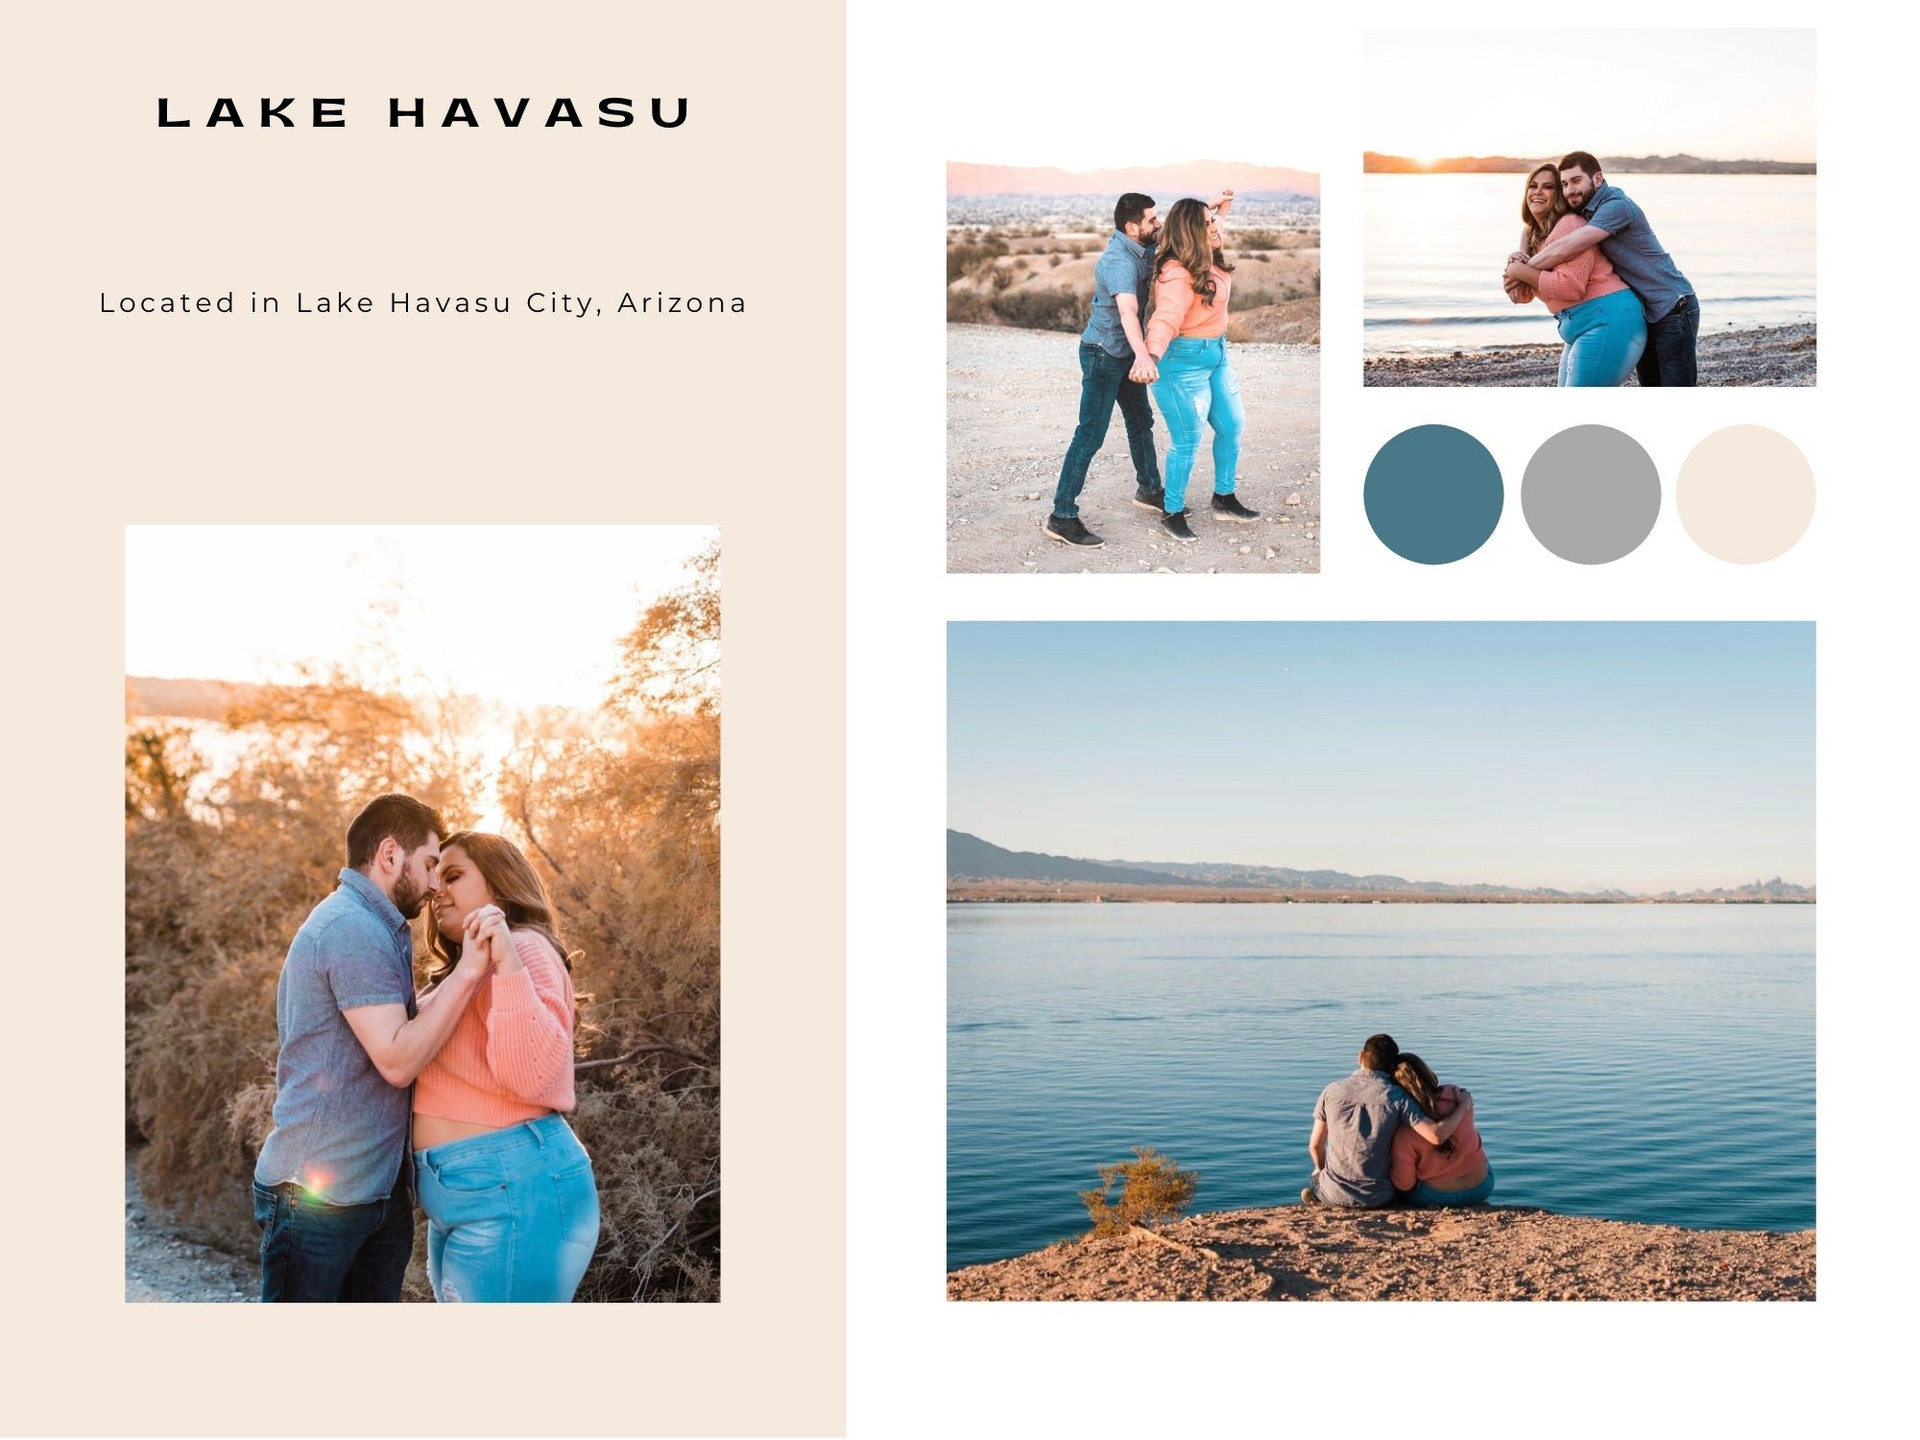 lake havasu city arizona photographer travel engagement elopement